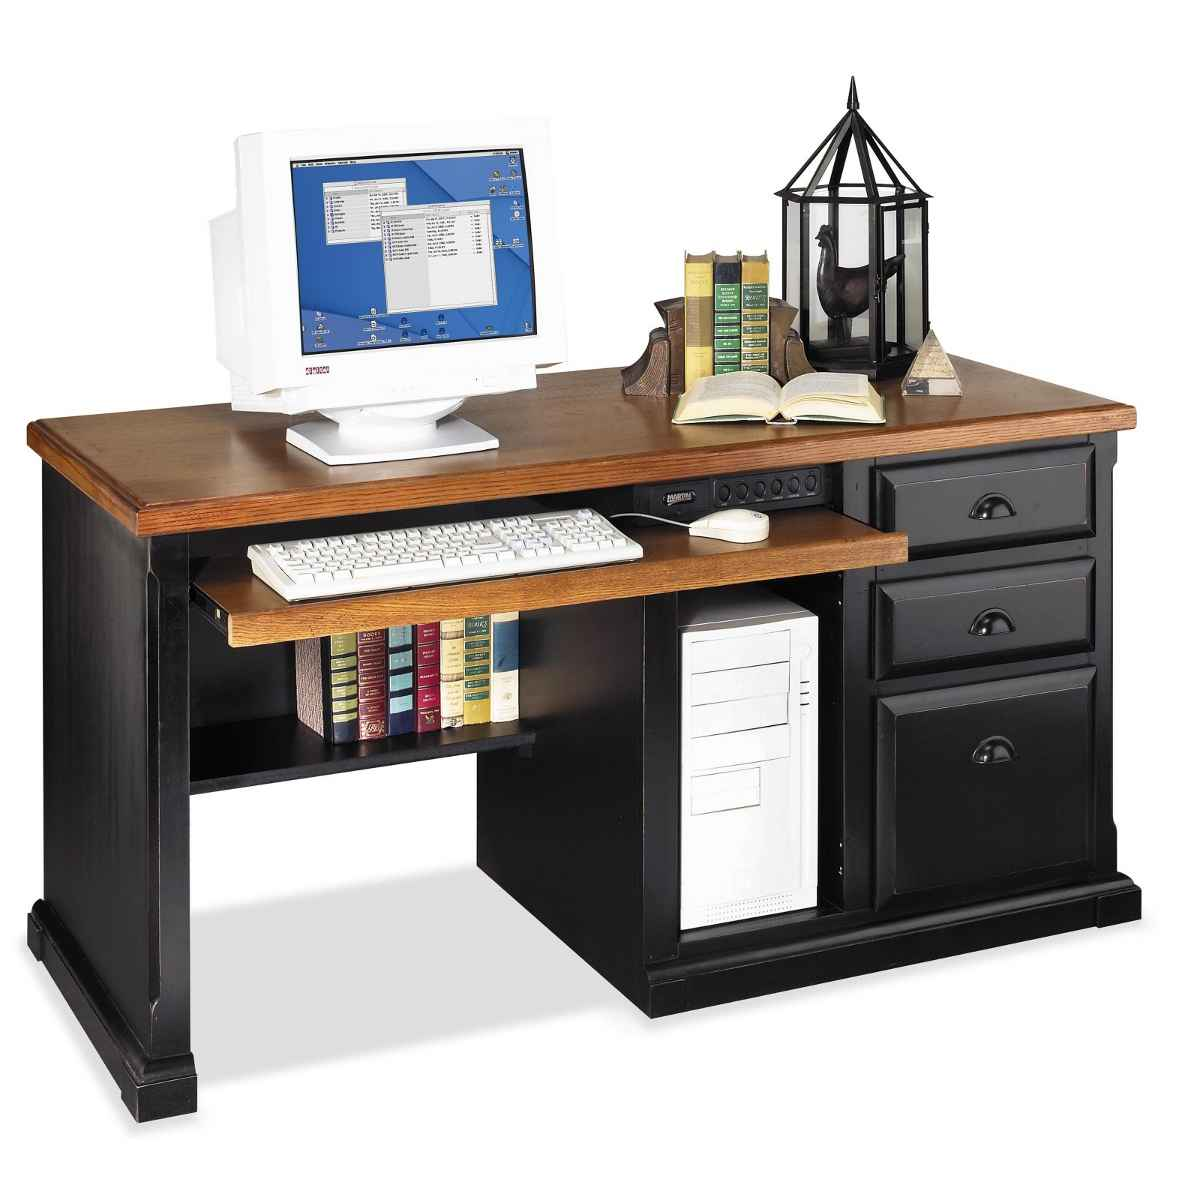 Kathy Ireland Southampton black desk for computer